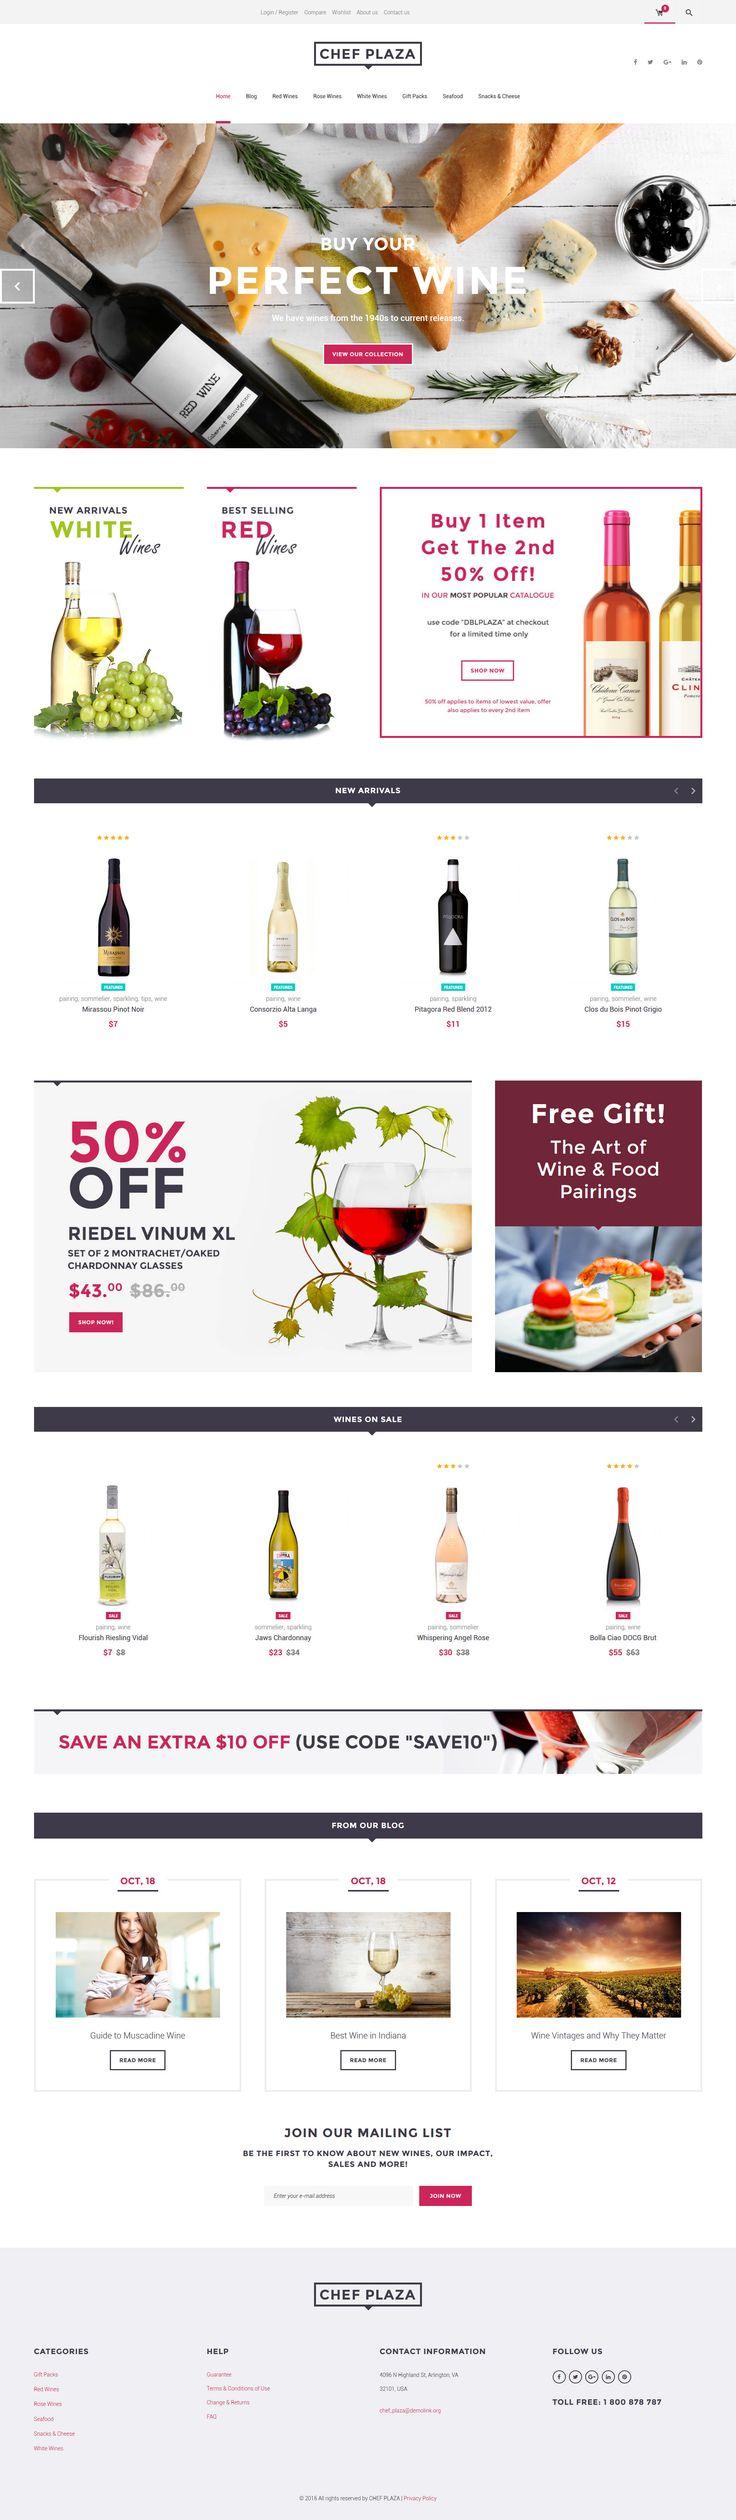 Wine Bar WooCommerce Theme - https://www.templatemonster.com/woocommerce-themes/61302.html